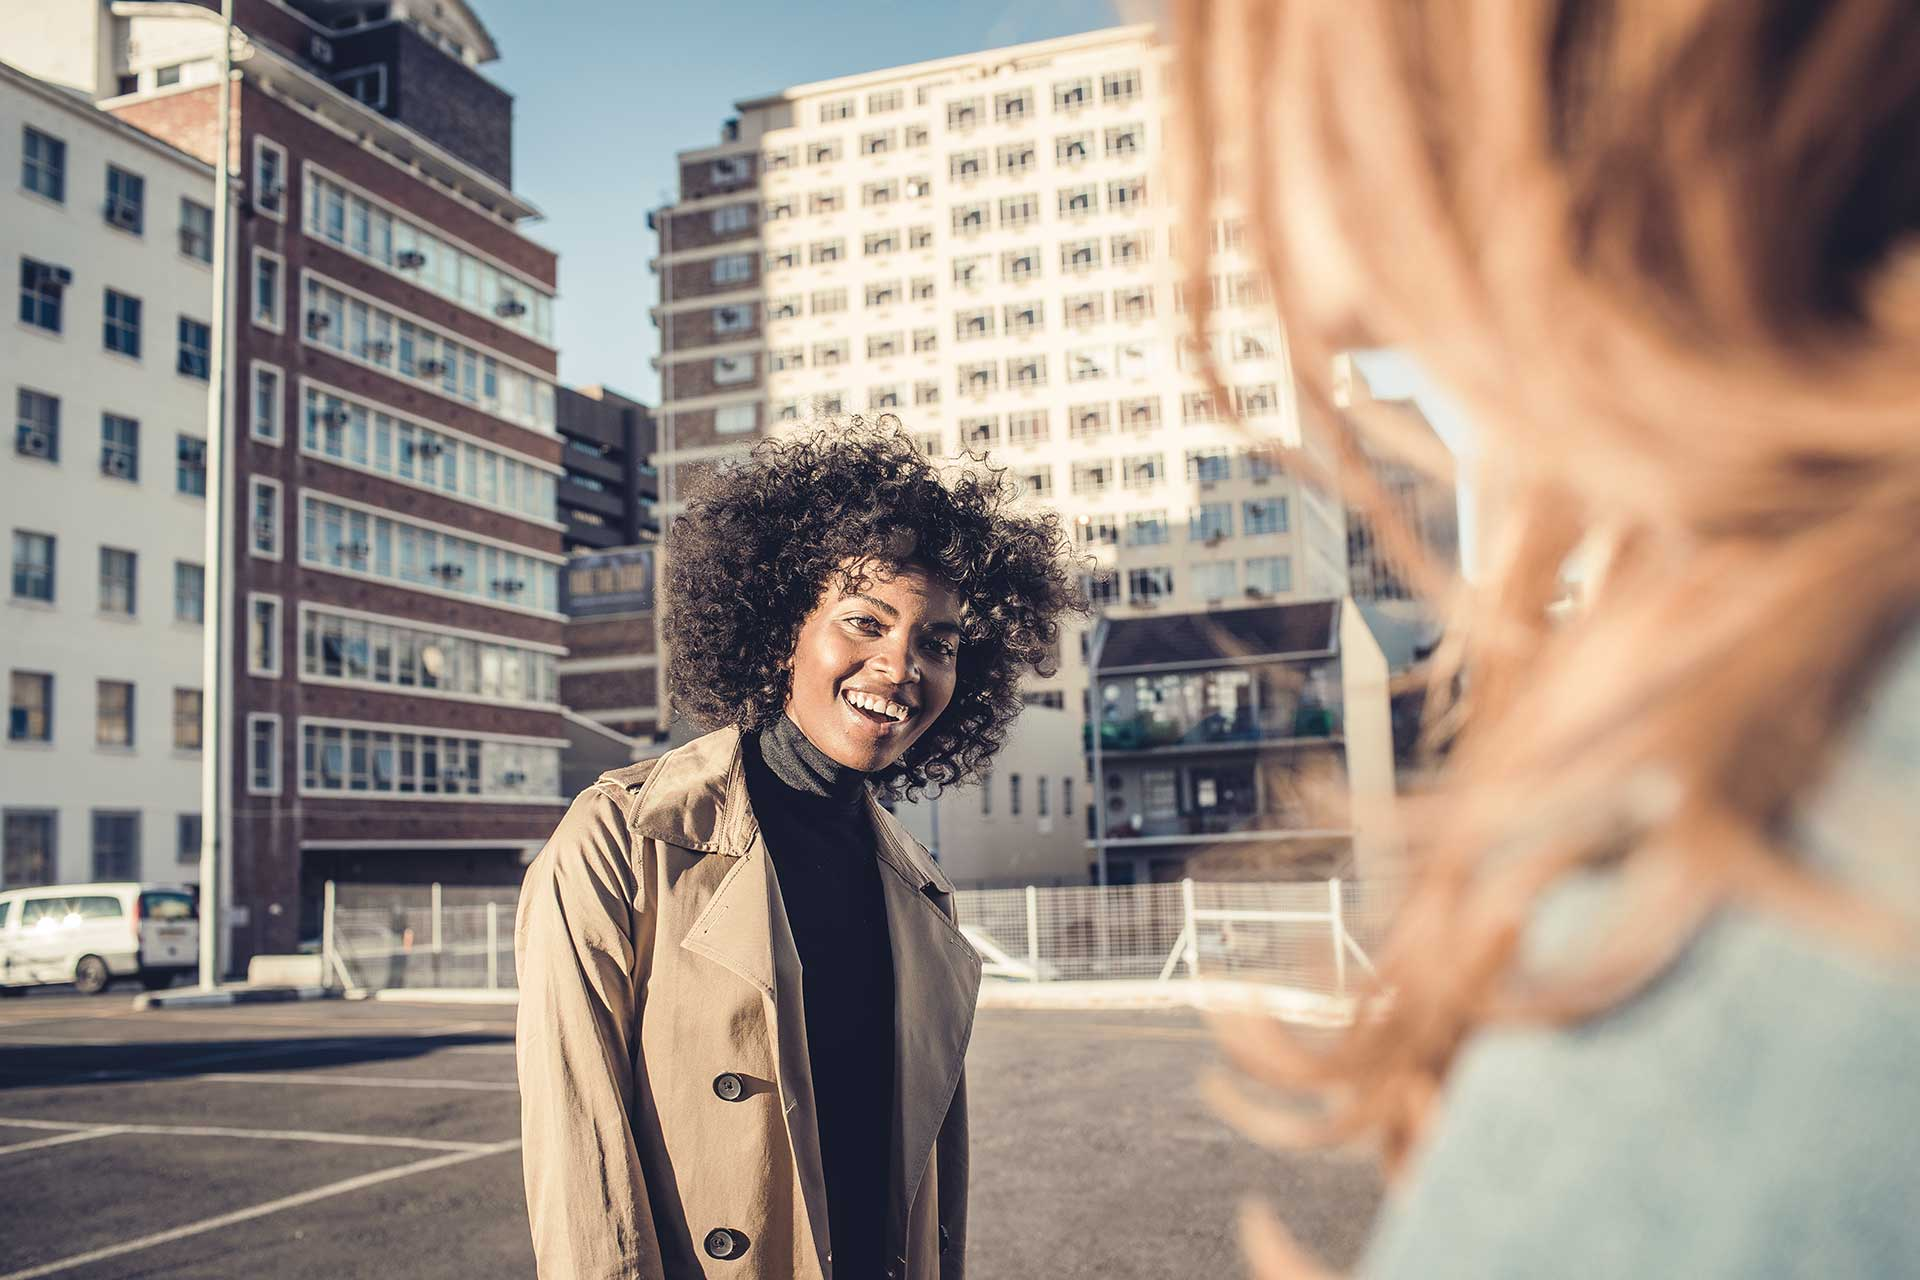 Urban People Lifestyle Fotograf Cape town Kapstadt Südafrika Freunde Frauen